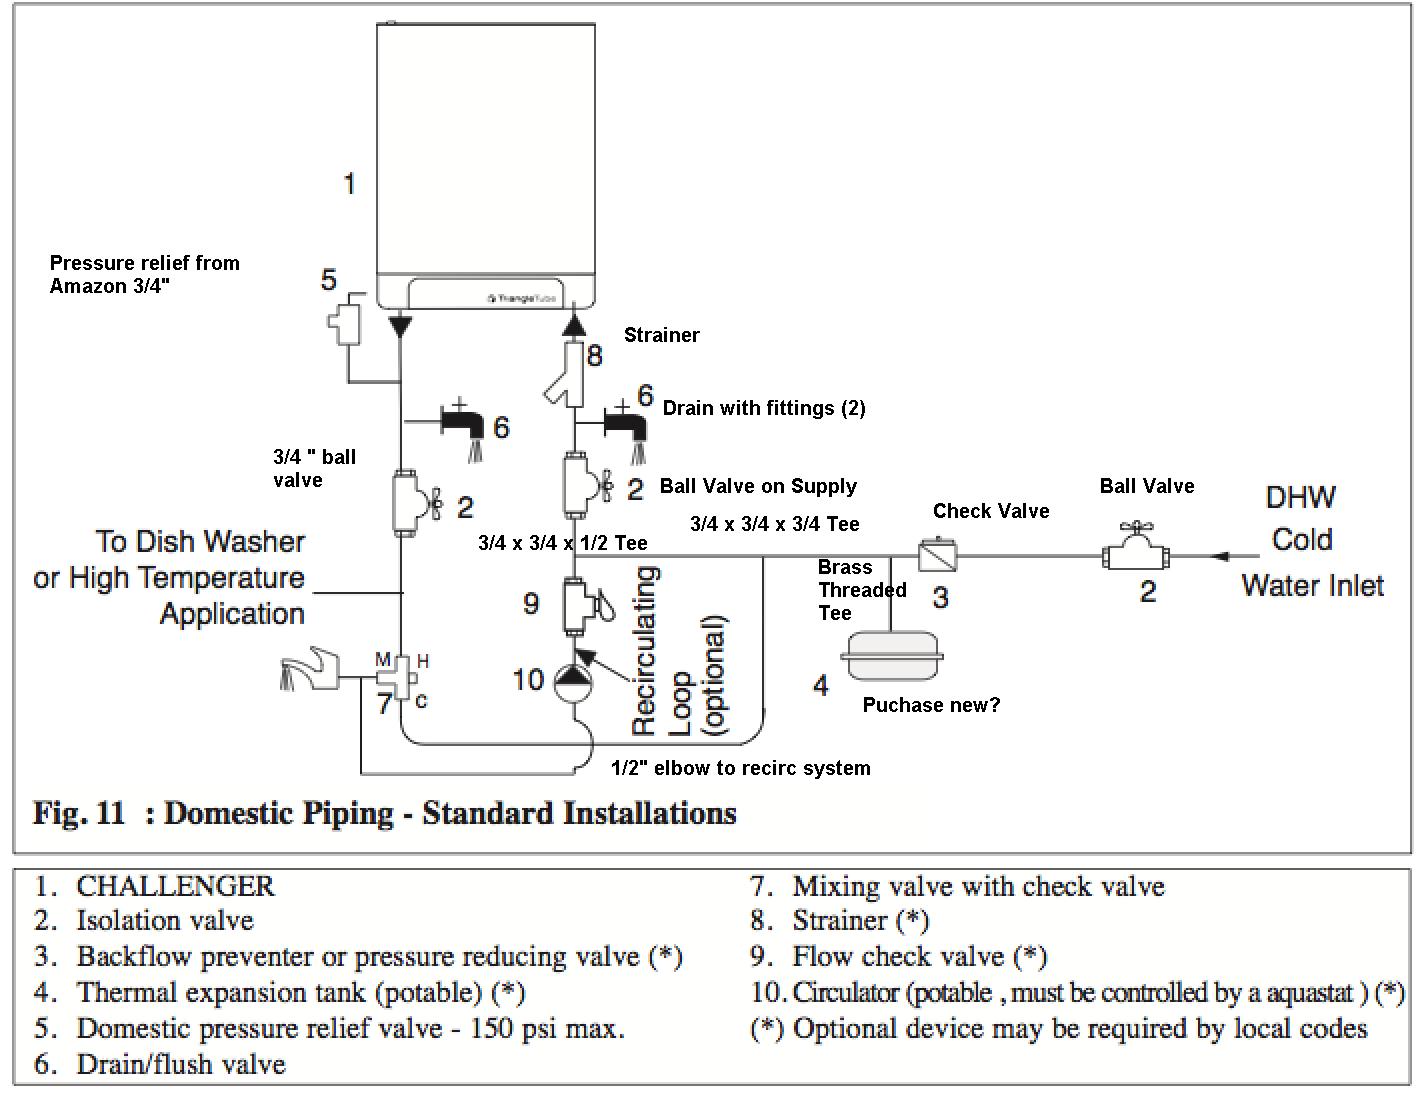 Miraculous Combi Boiler Combi Boiler Piping Diagram Wiring Cloud Staixaidewilluminateatxorg